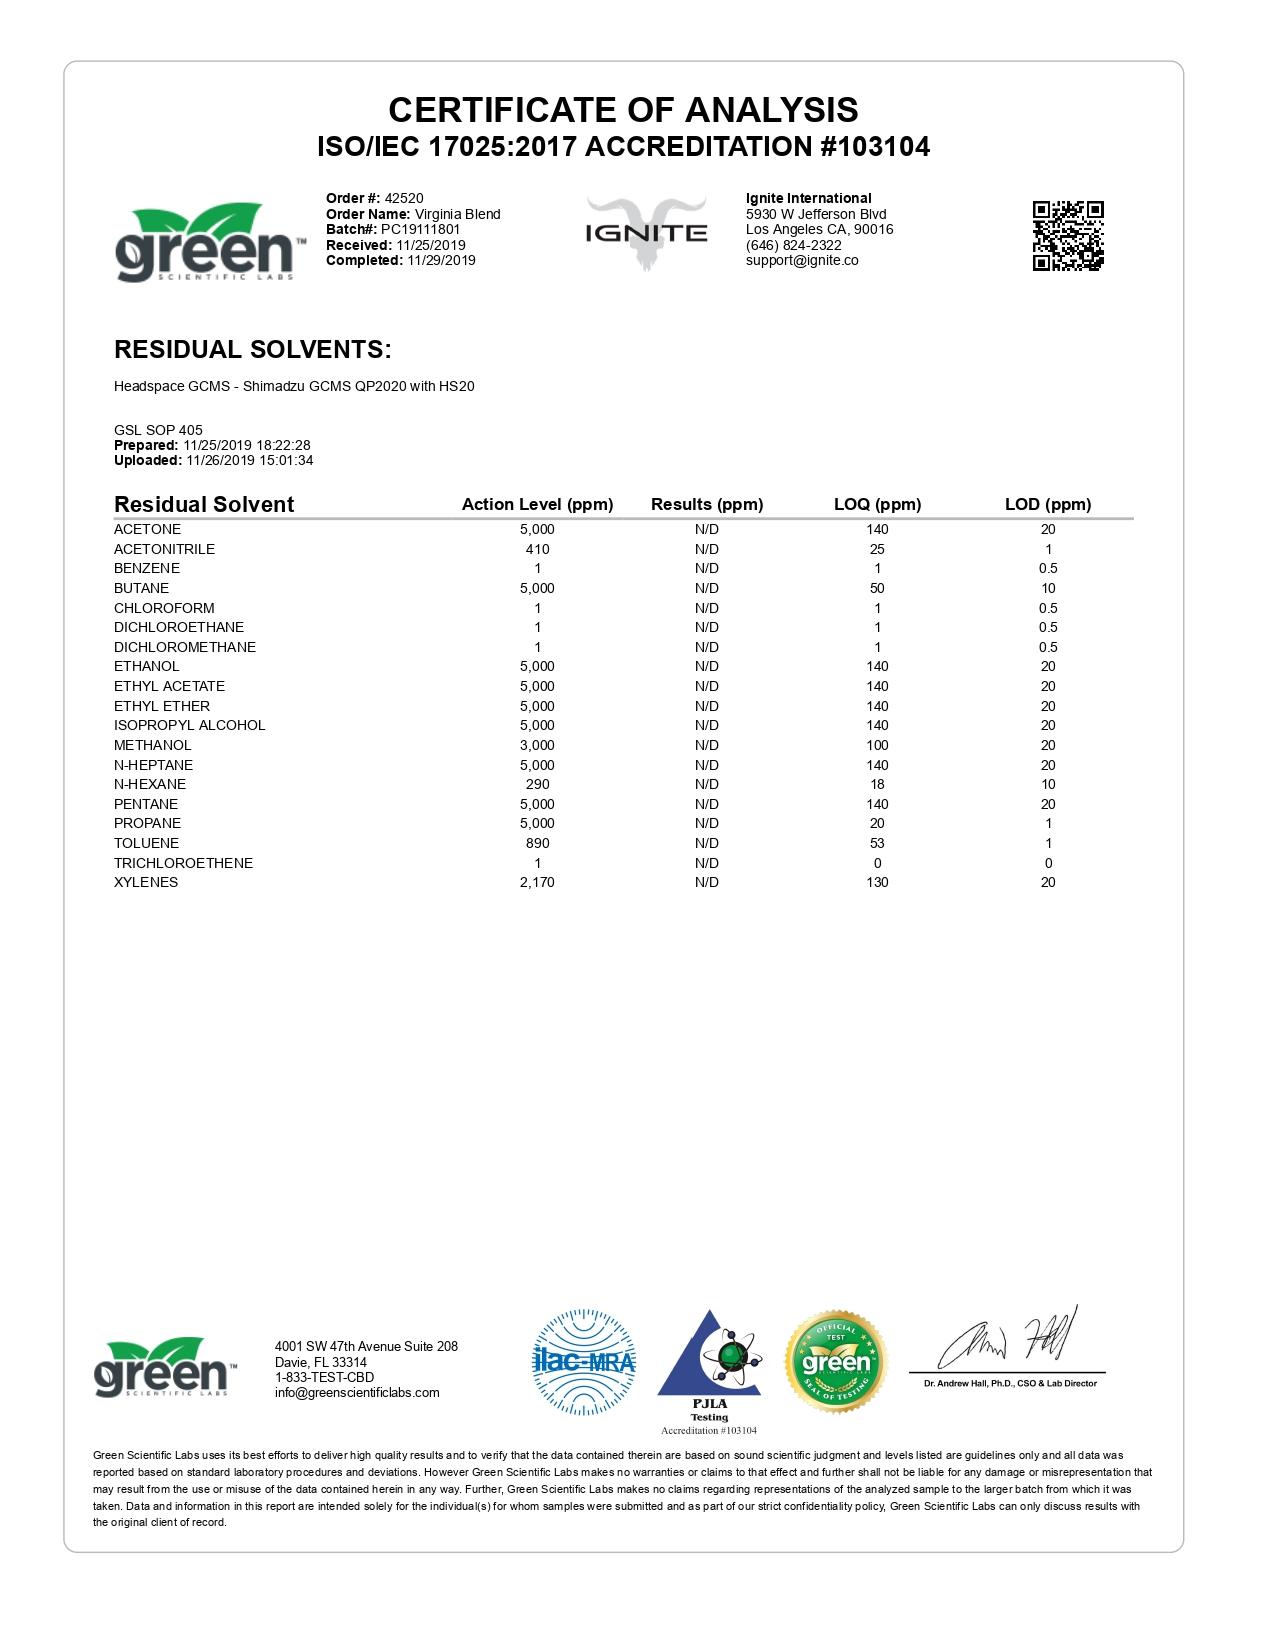 IGNITE CBD Pod Virginia Blend Lab Report